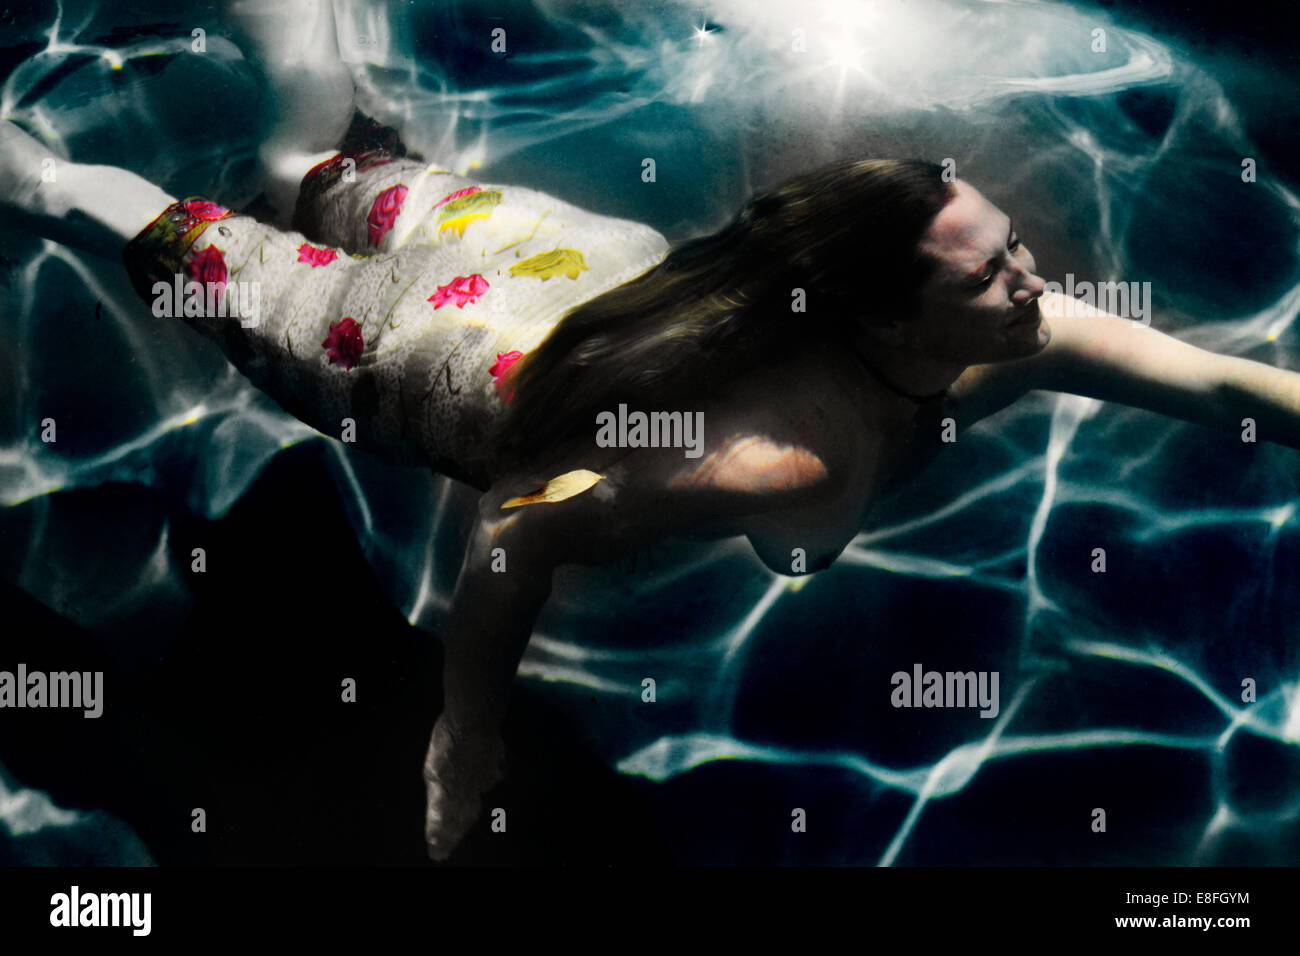 Donna di nuoto in sarong Immagini Stock